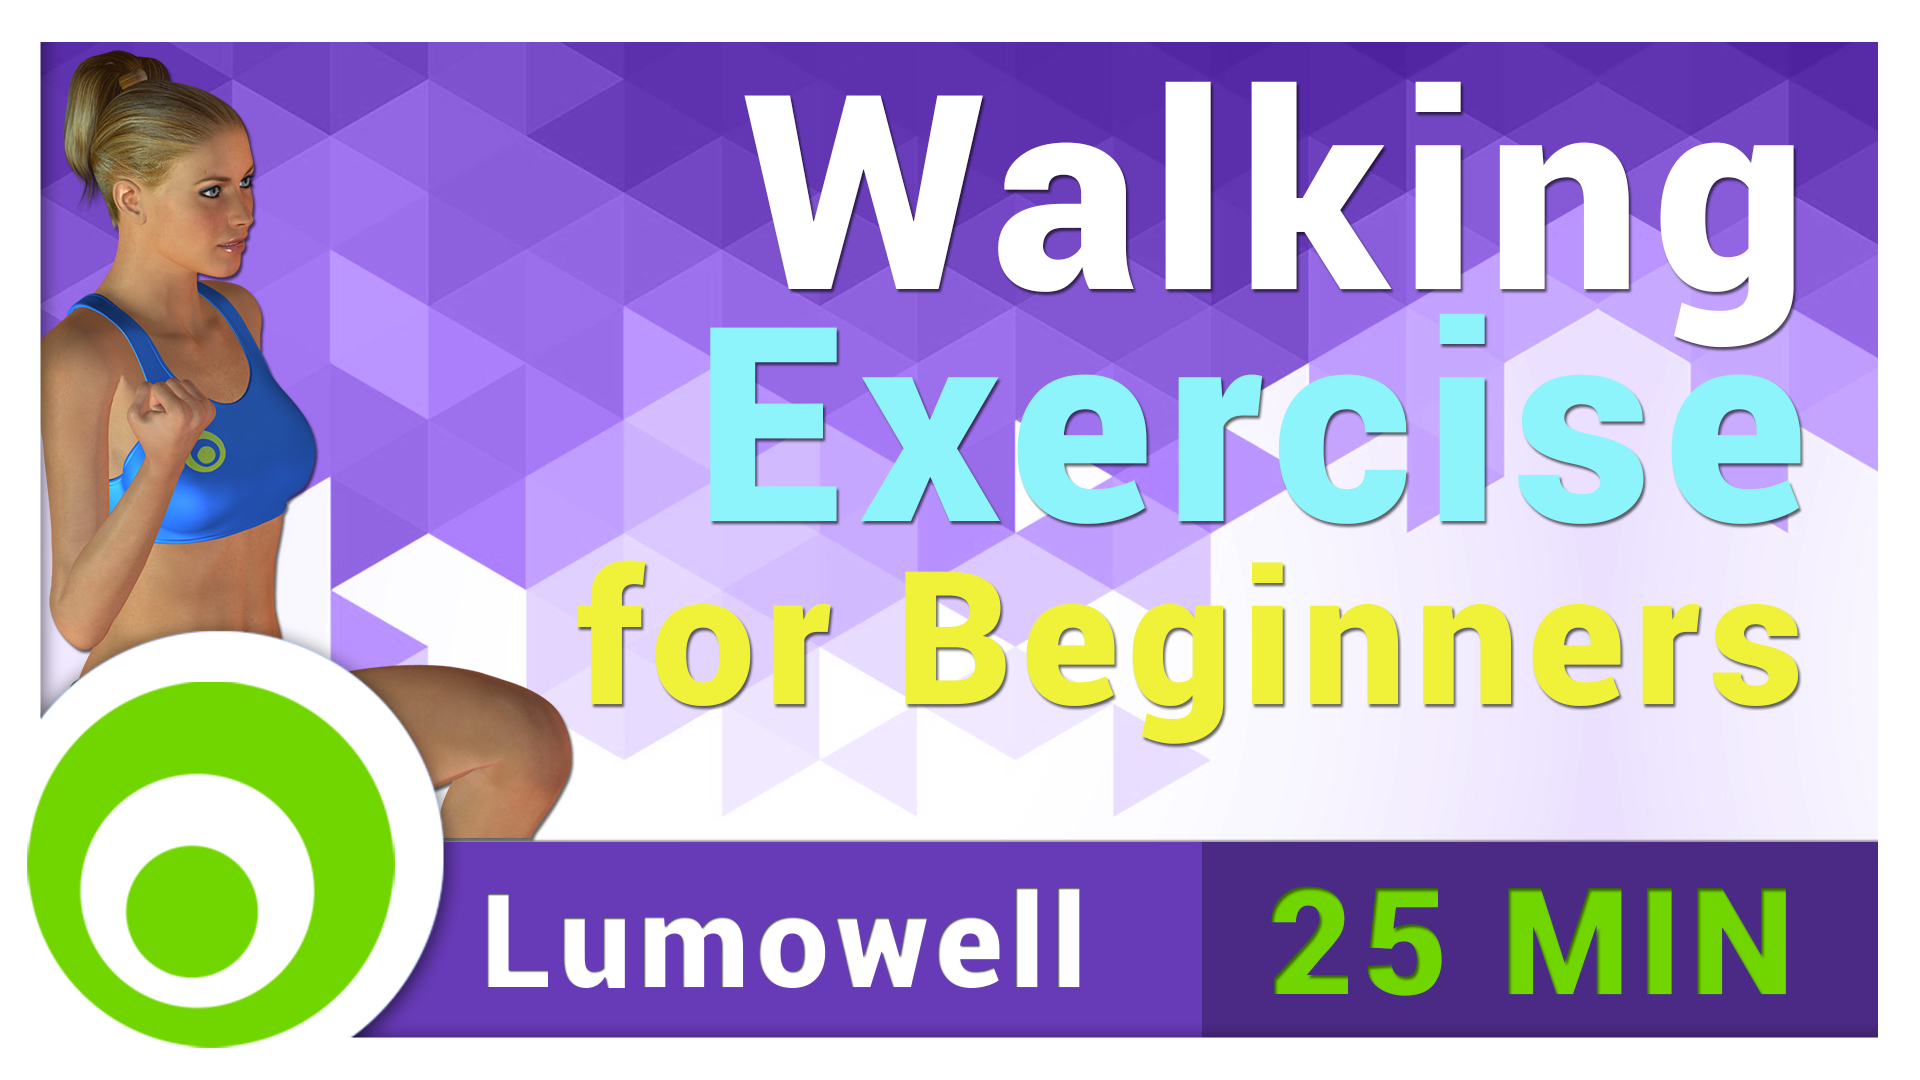 Walking Exercise for Beginners